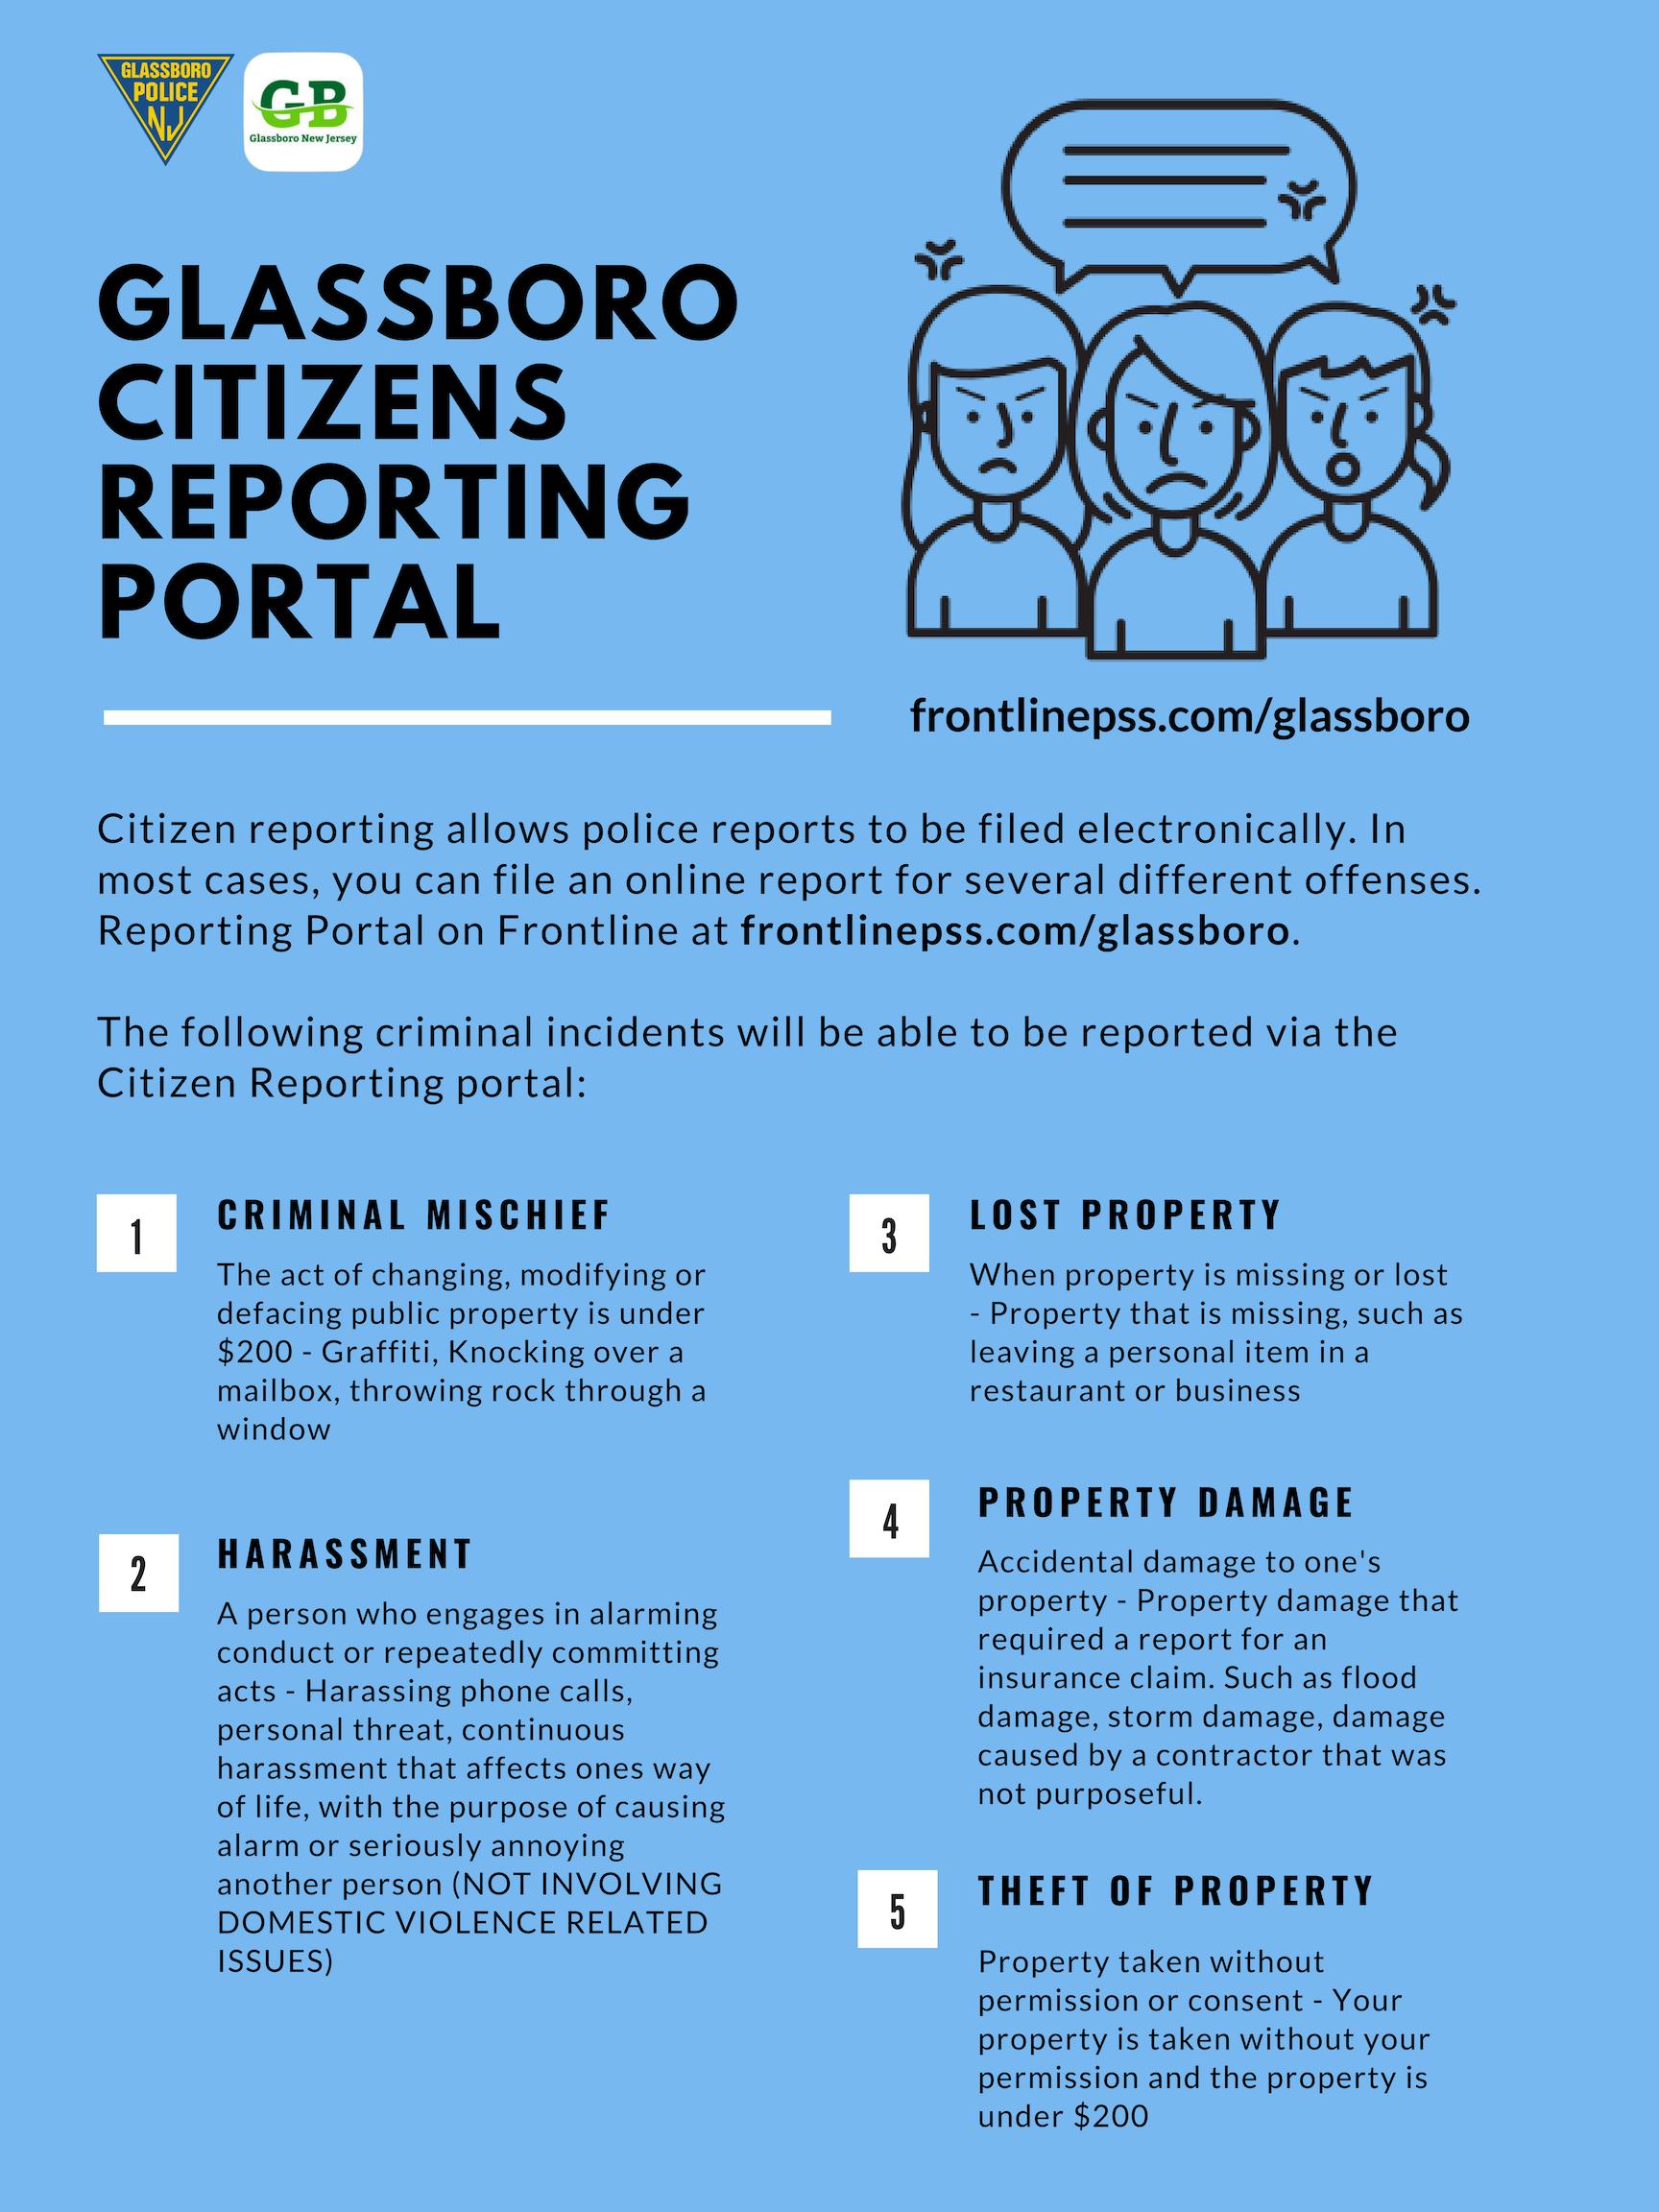 glassboro citizens reporting portal.png